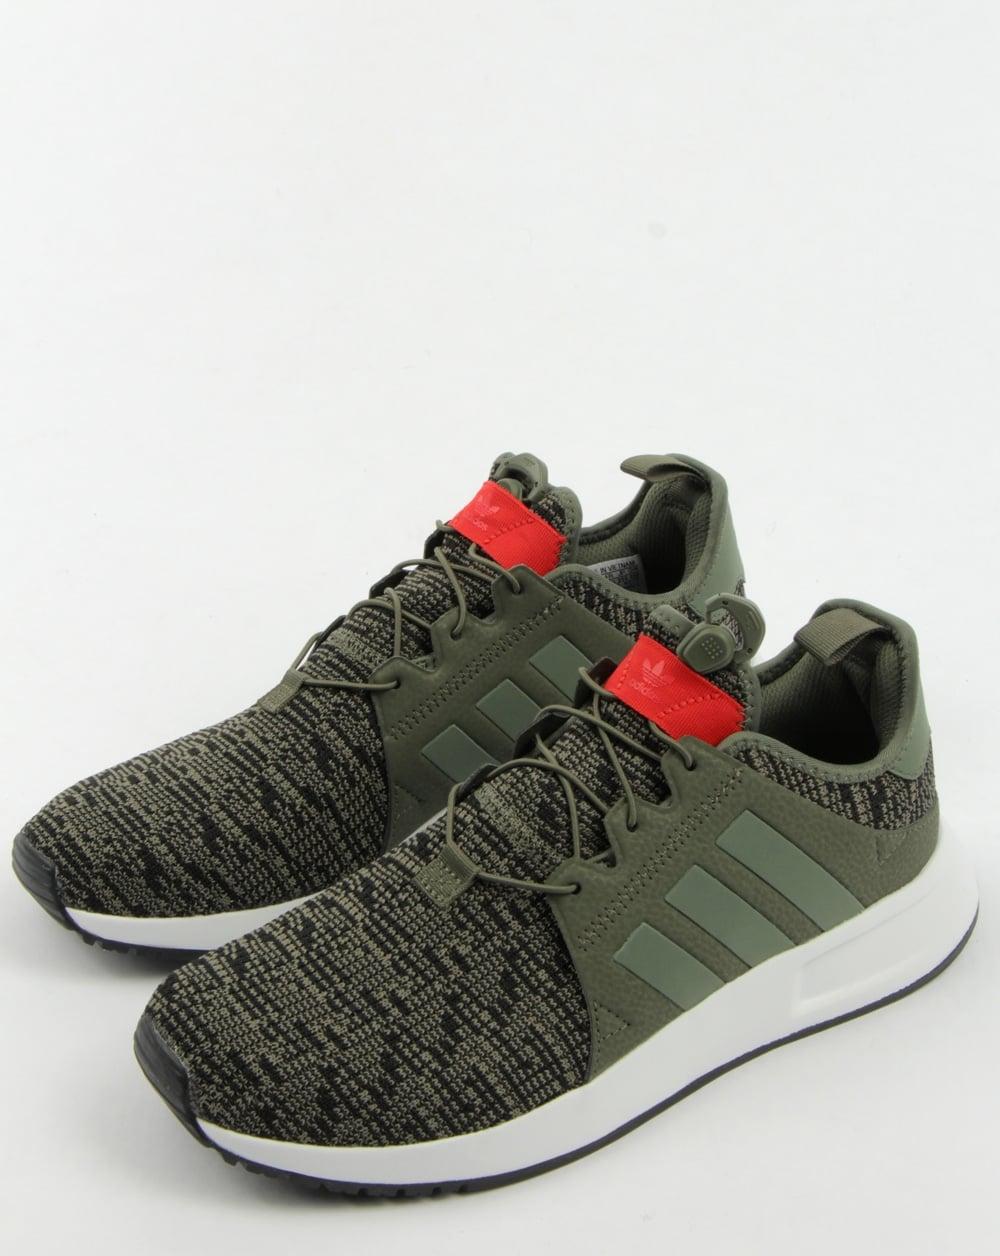 adidas xplr trainers green